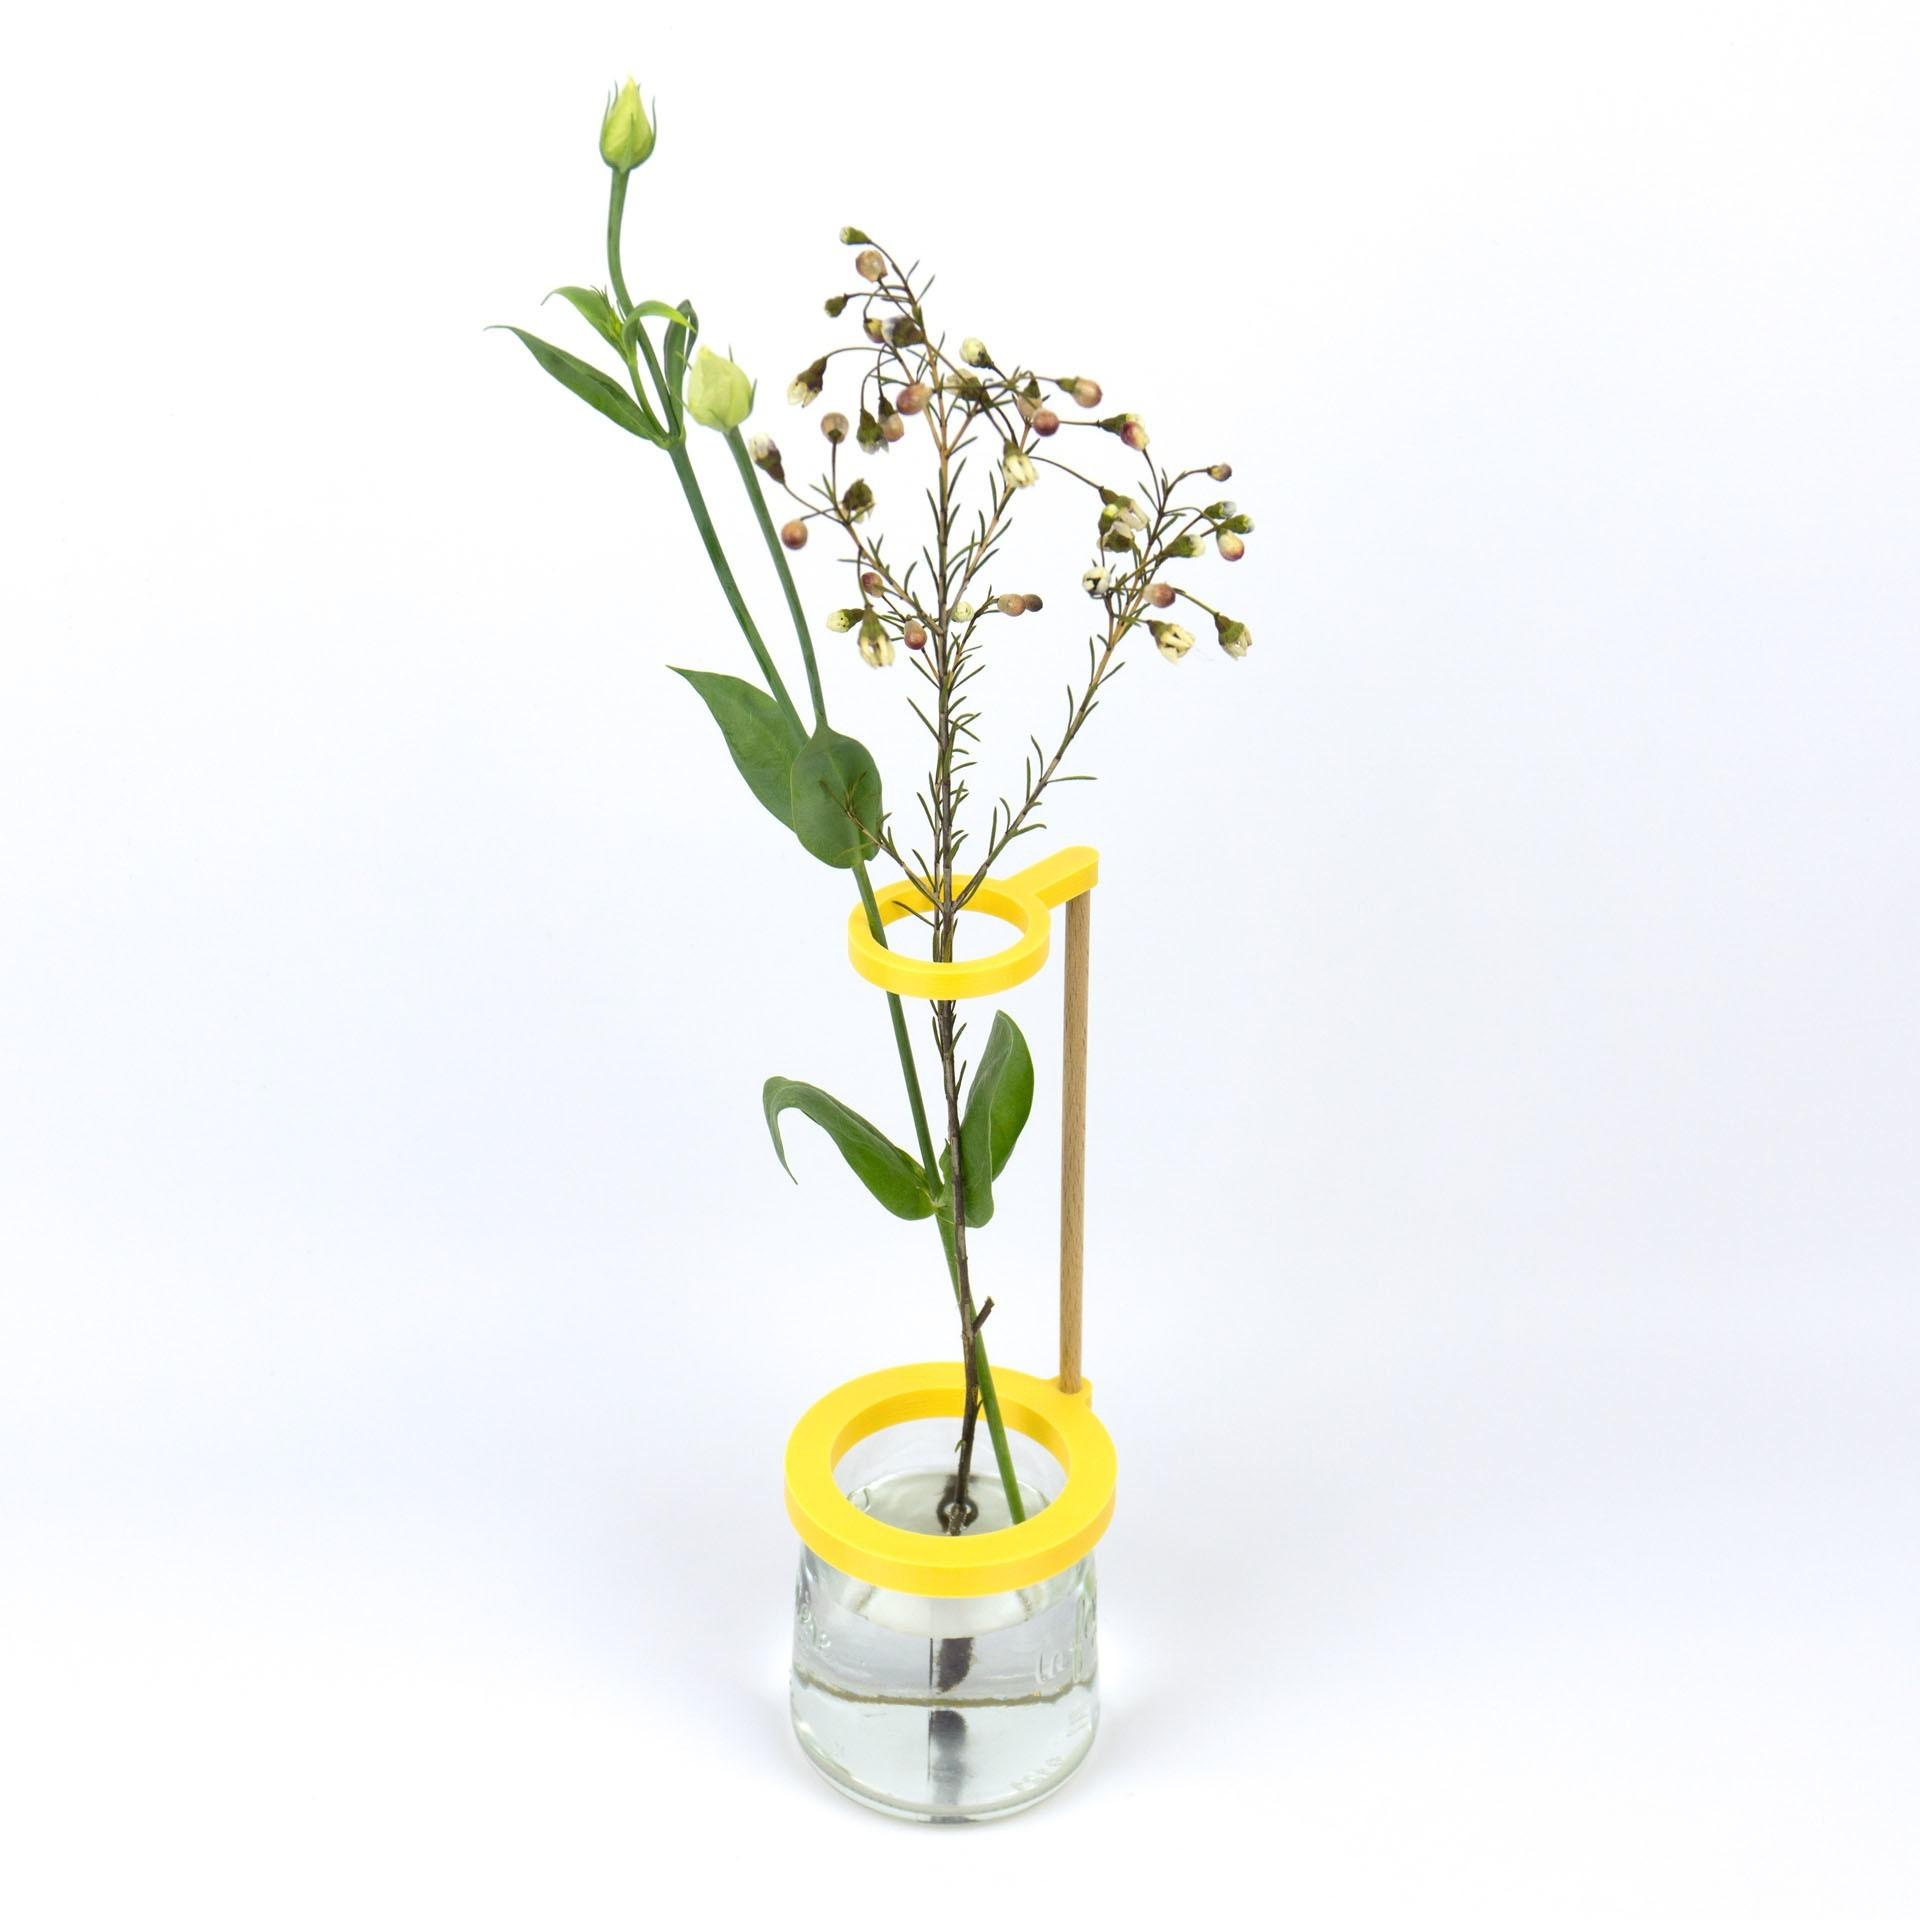 Shooting Pots et impression 3D - 2018 02 10 - 17.jpg Download STL file Stem vase / Vase to be fixed on a glass pot • 3D print object, Jonathan-AtelierVOUS